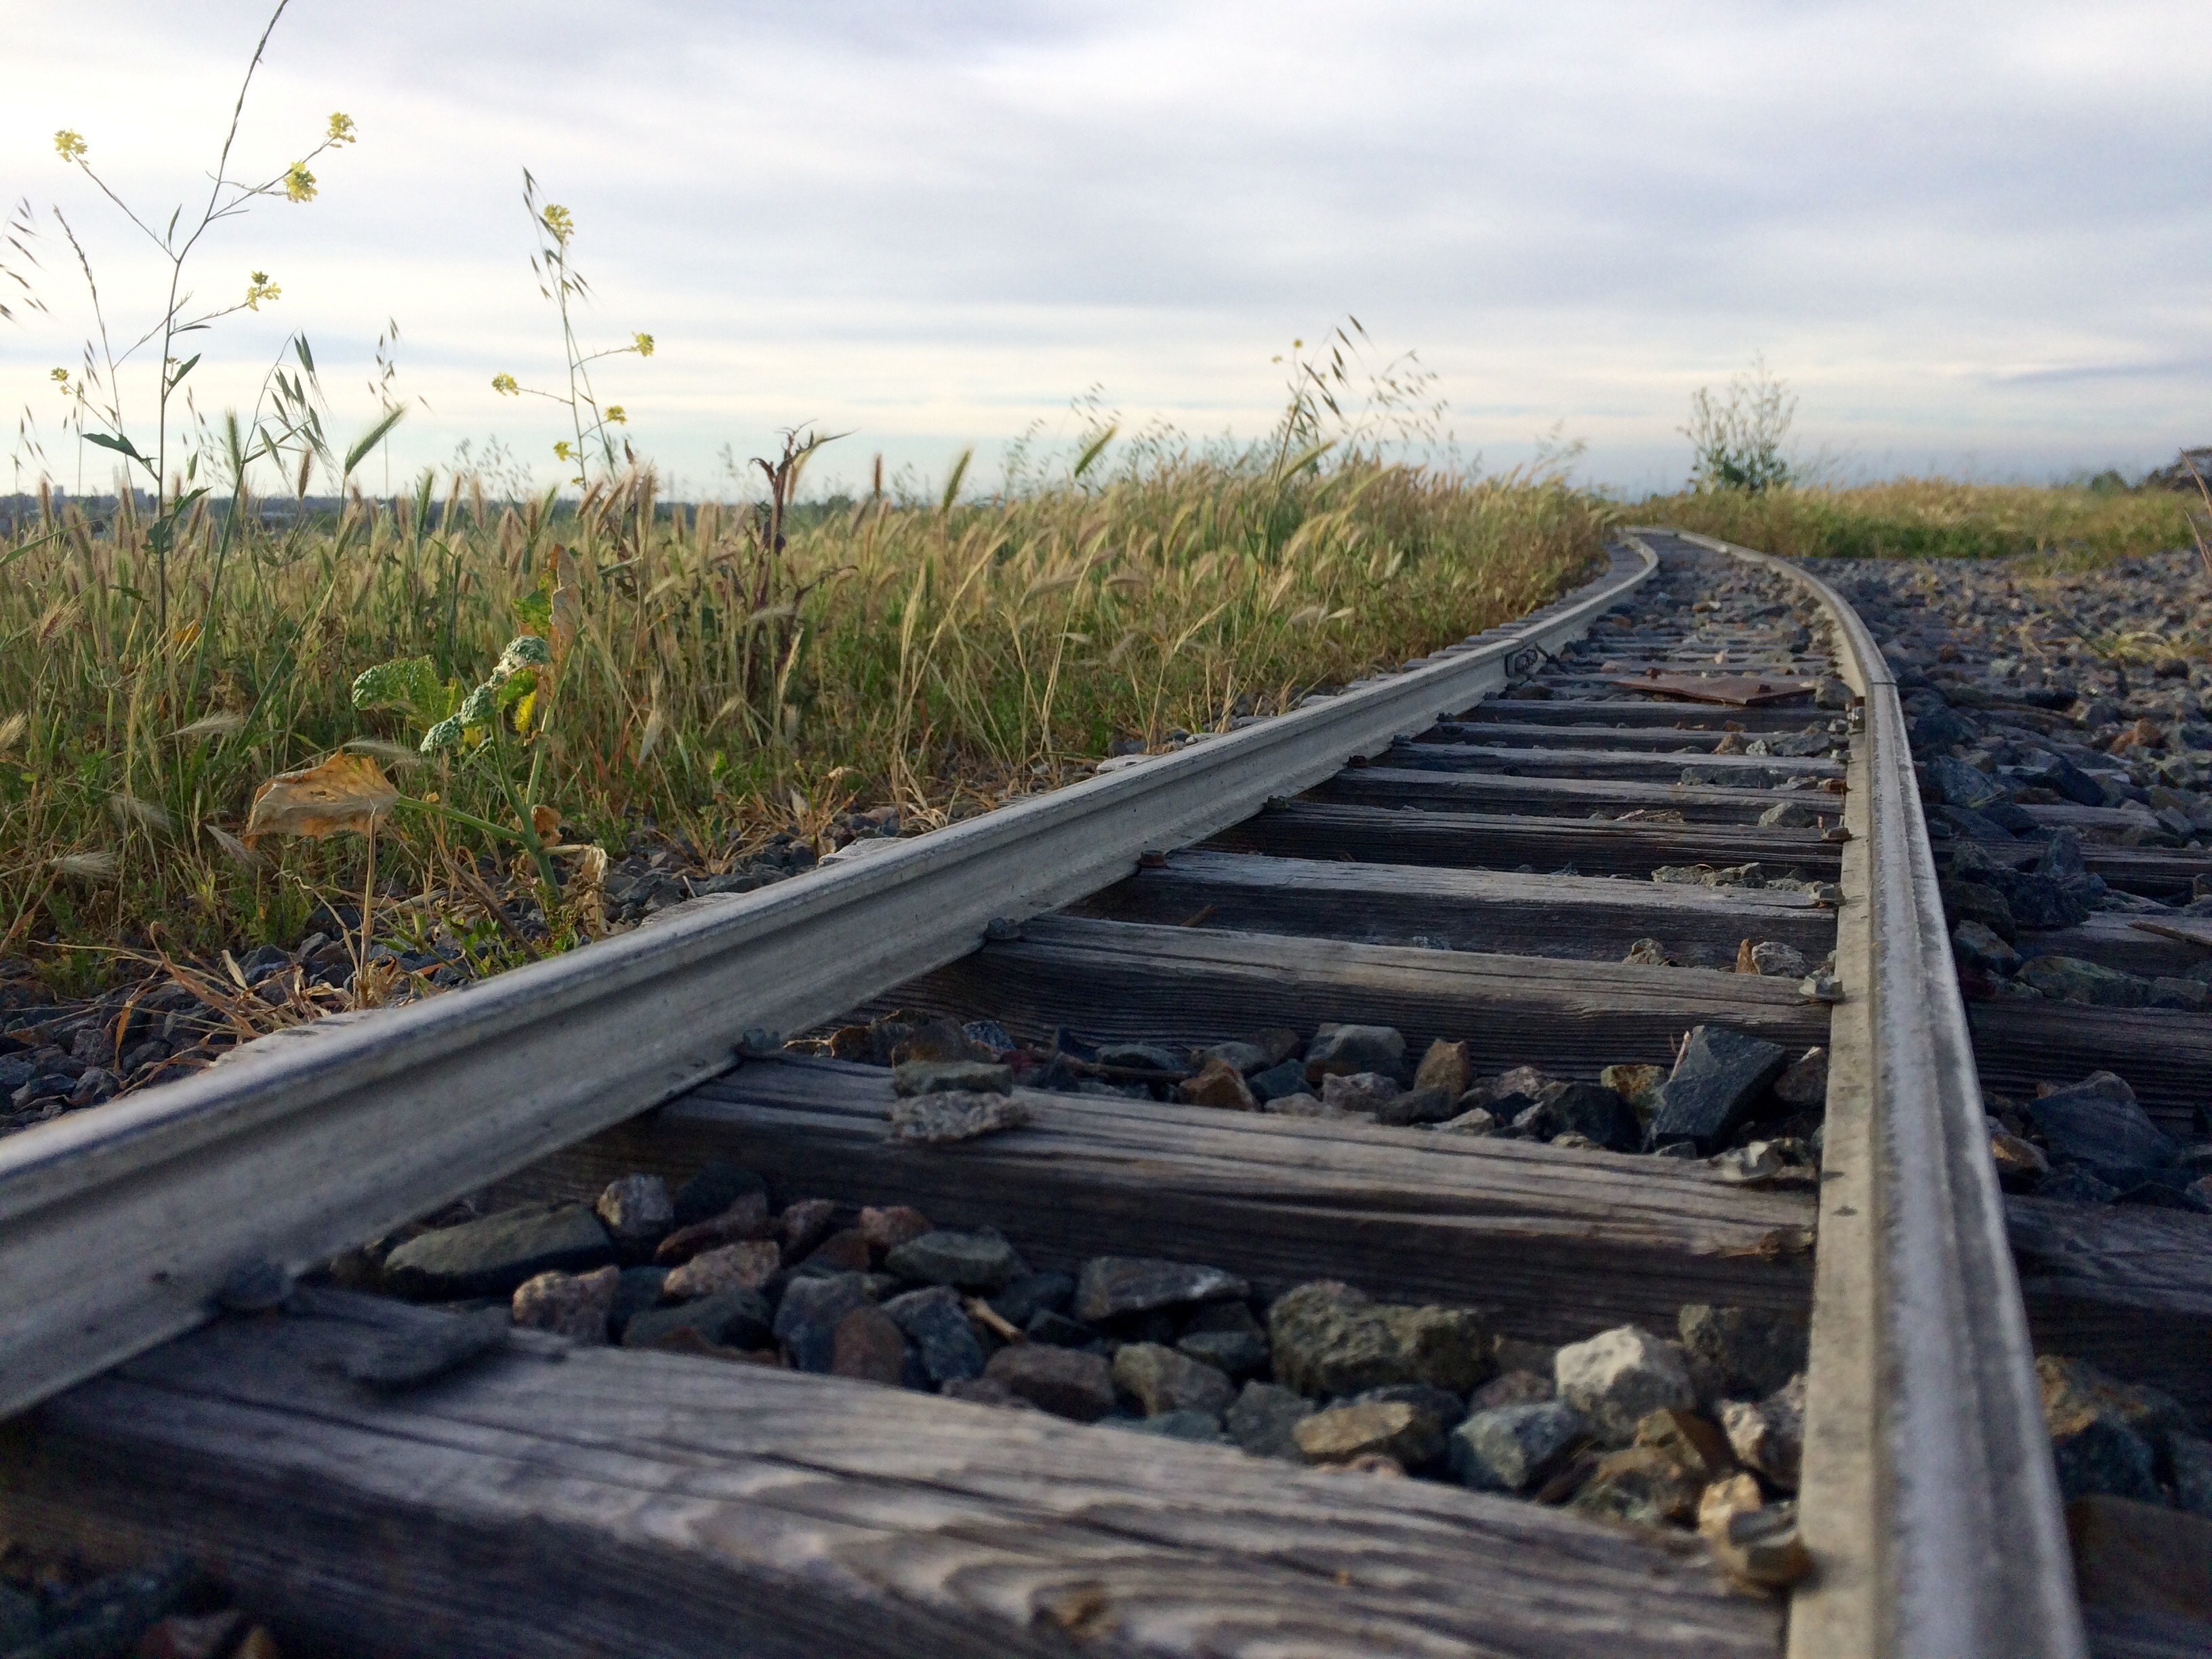 Railroad track against sky photo